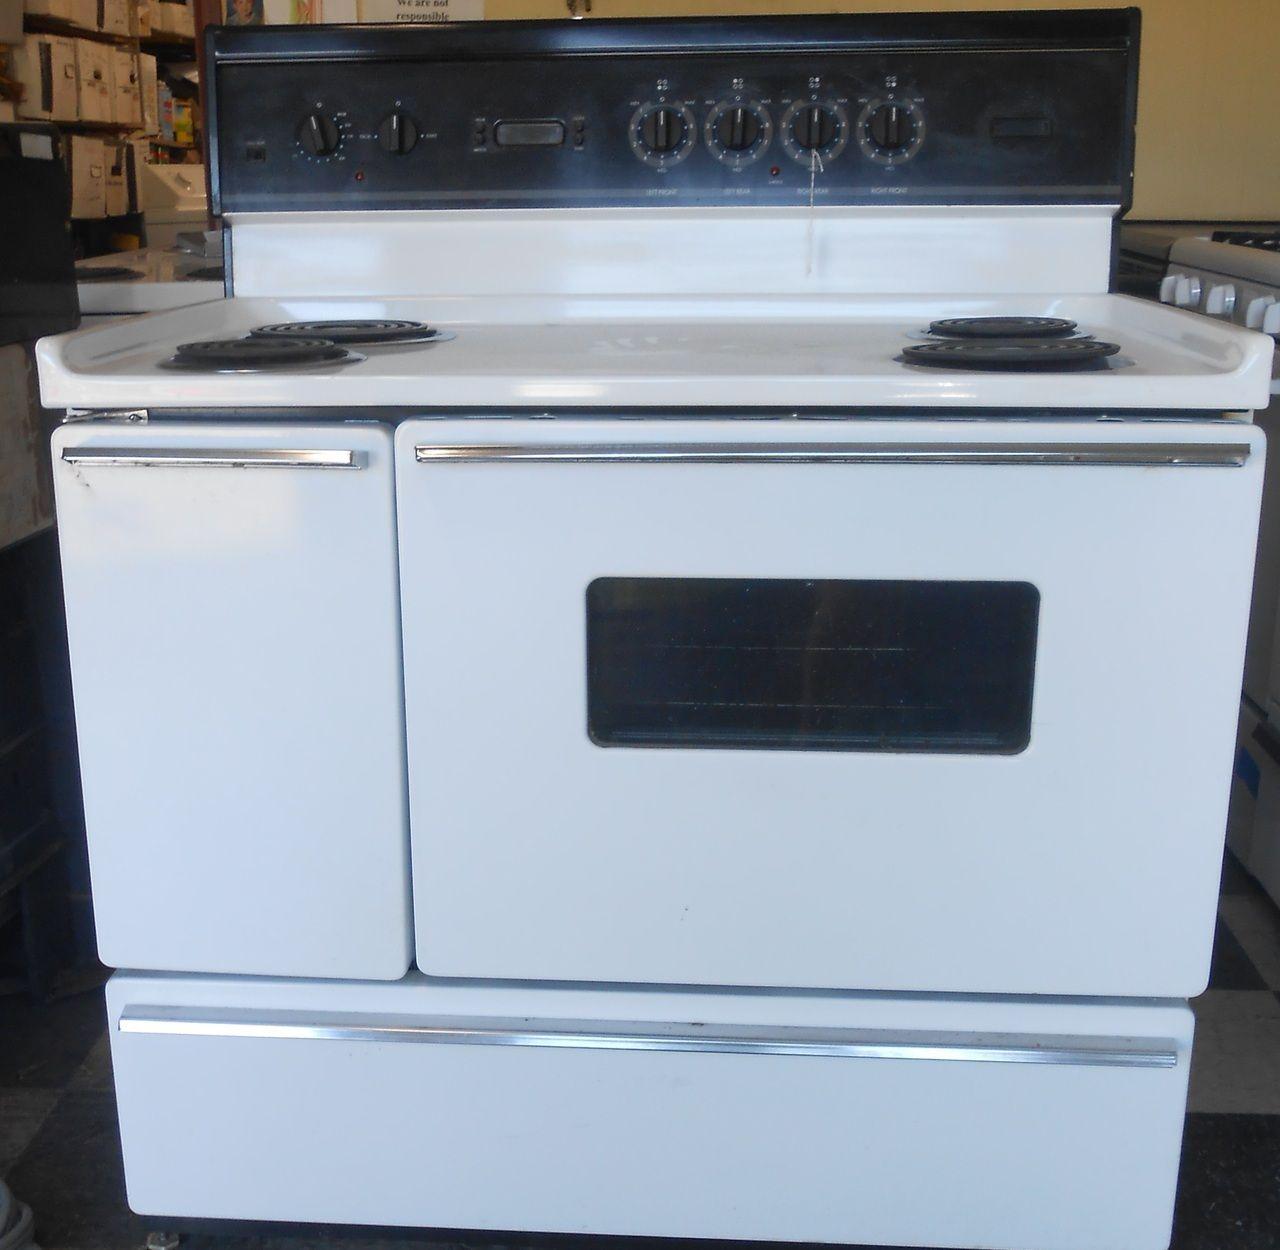 40 Inch Electric Range Part - 21: Appliance City - TAPPAN 40 INCH ELECTRIC RANGE WHITE , $600.00 (http://